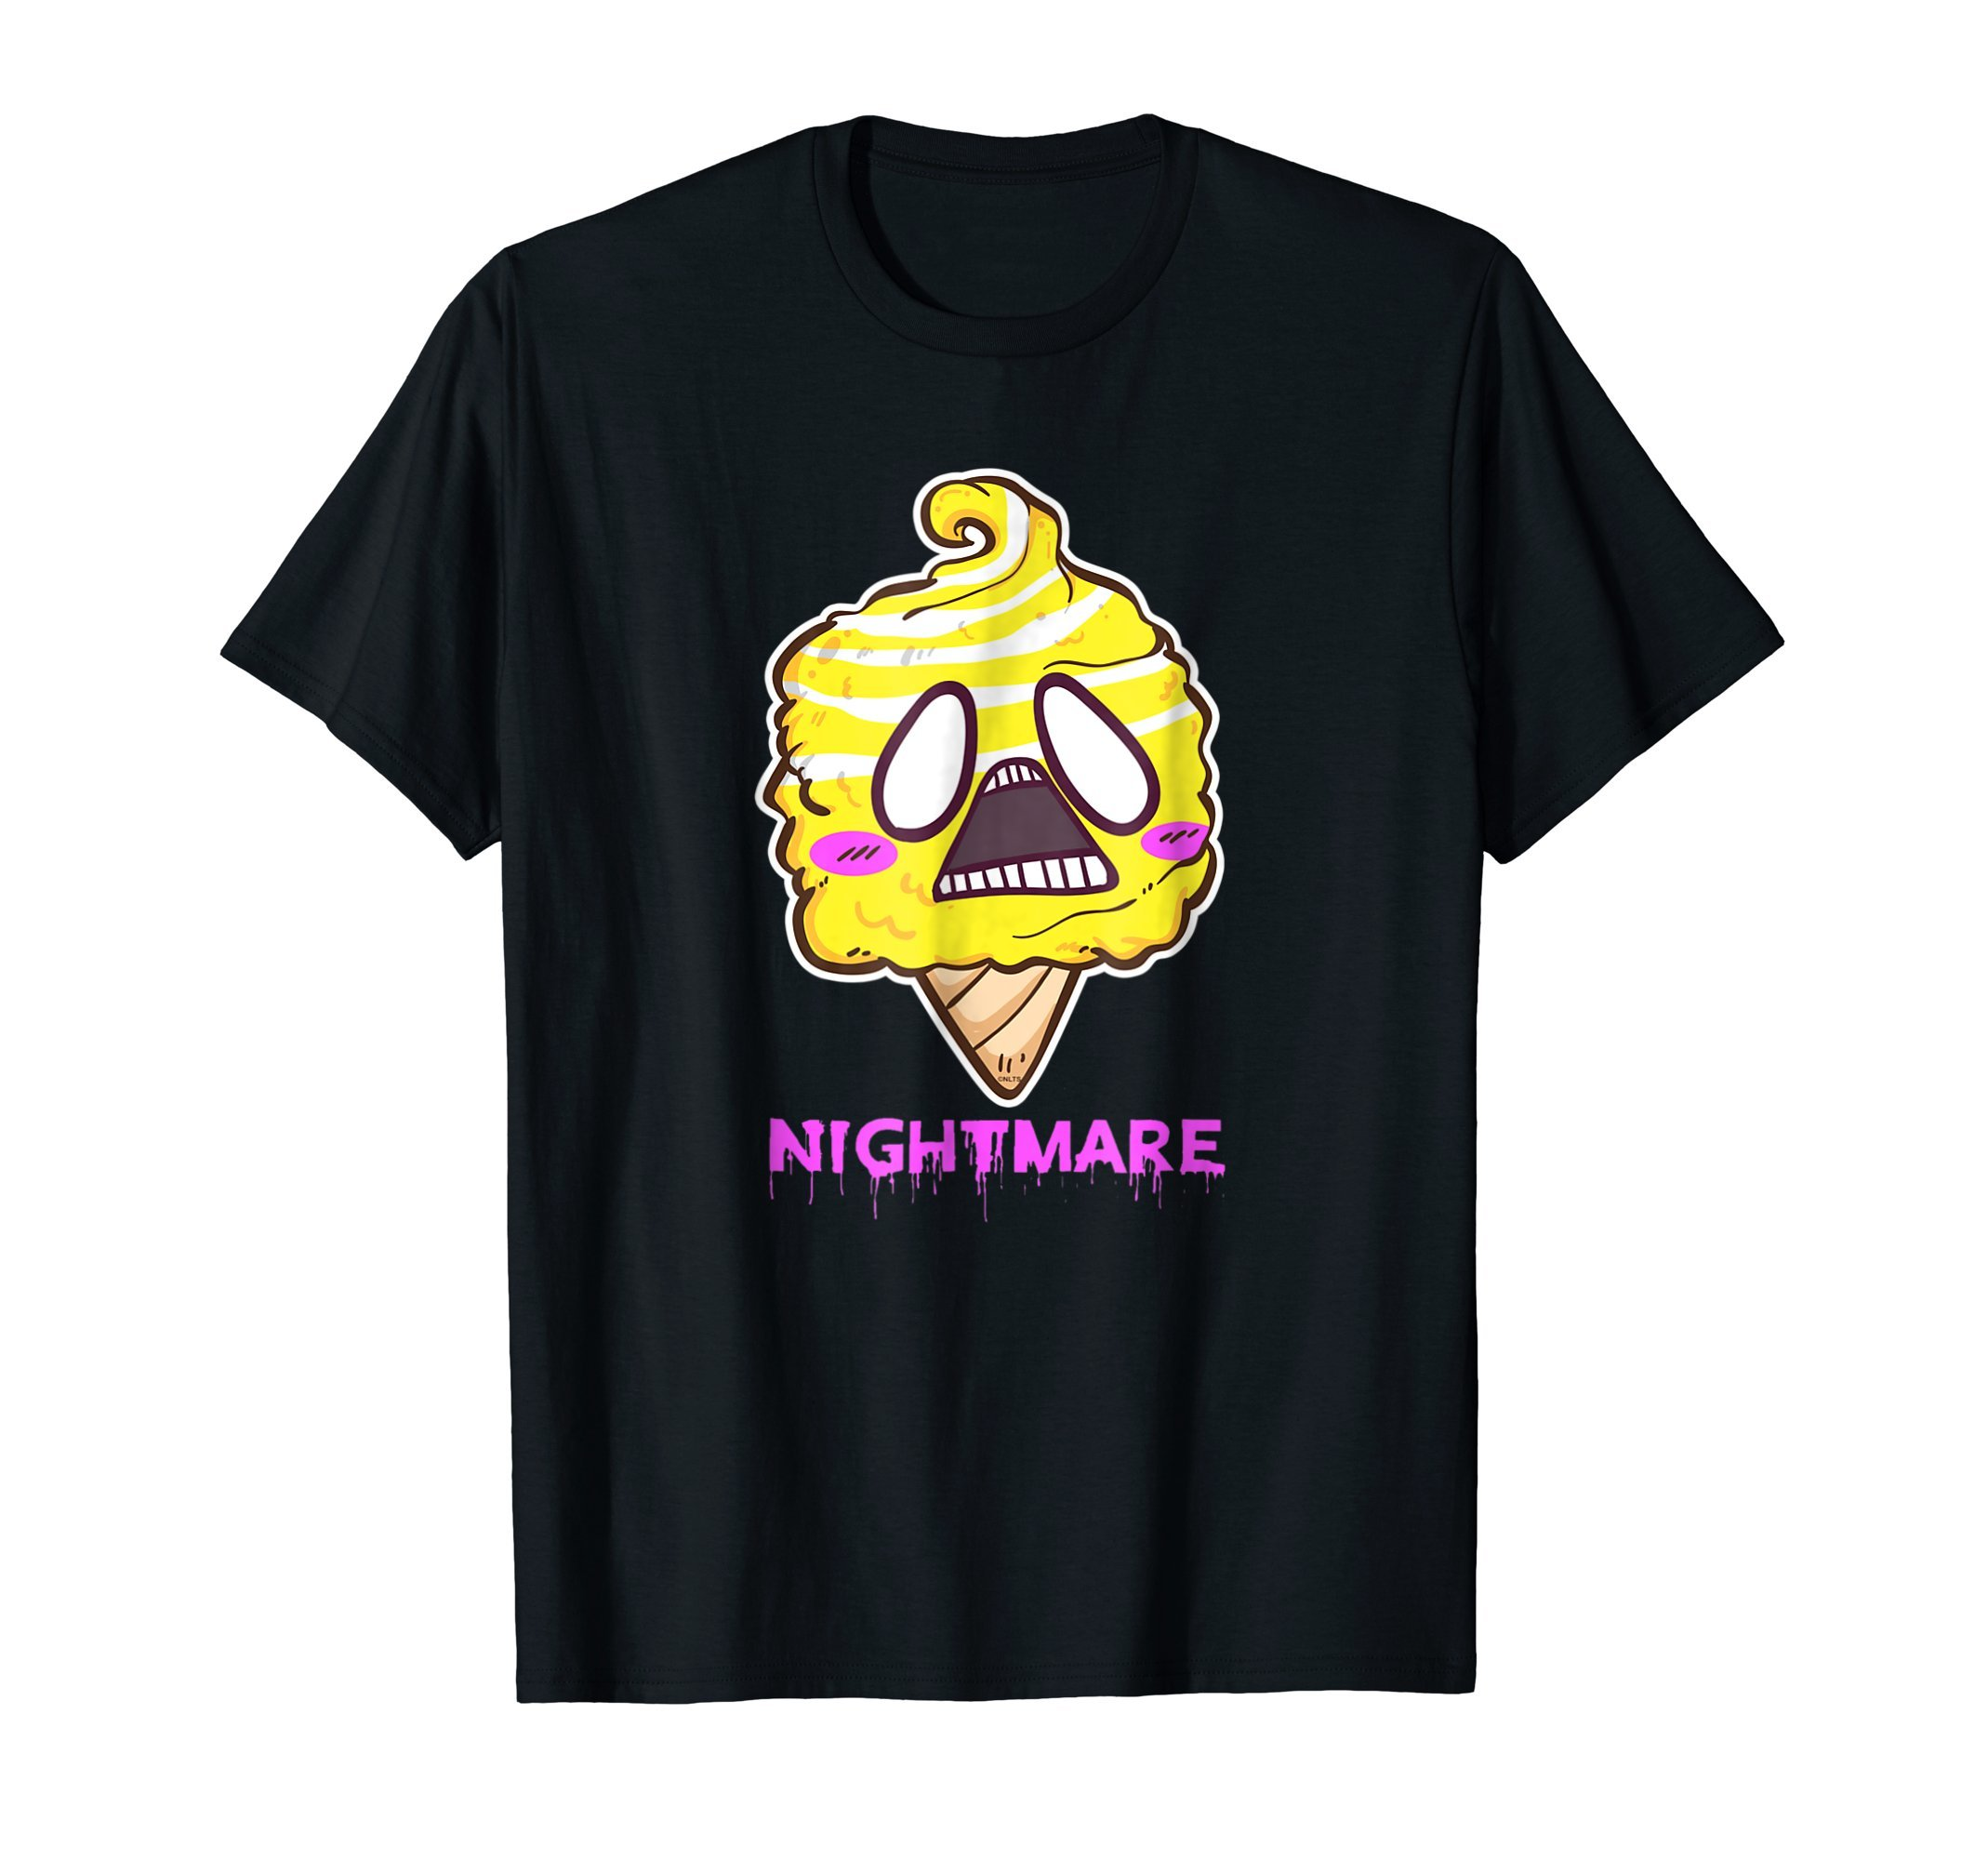 Cotton-candy-nightmare-Humor-Funny-T-Shirt-Tee-Shirt-gift